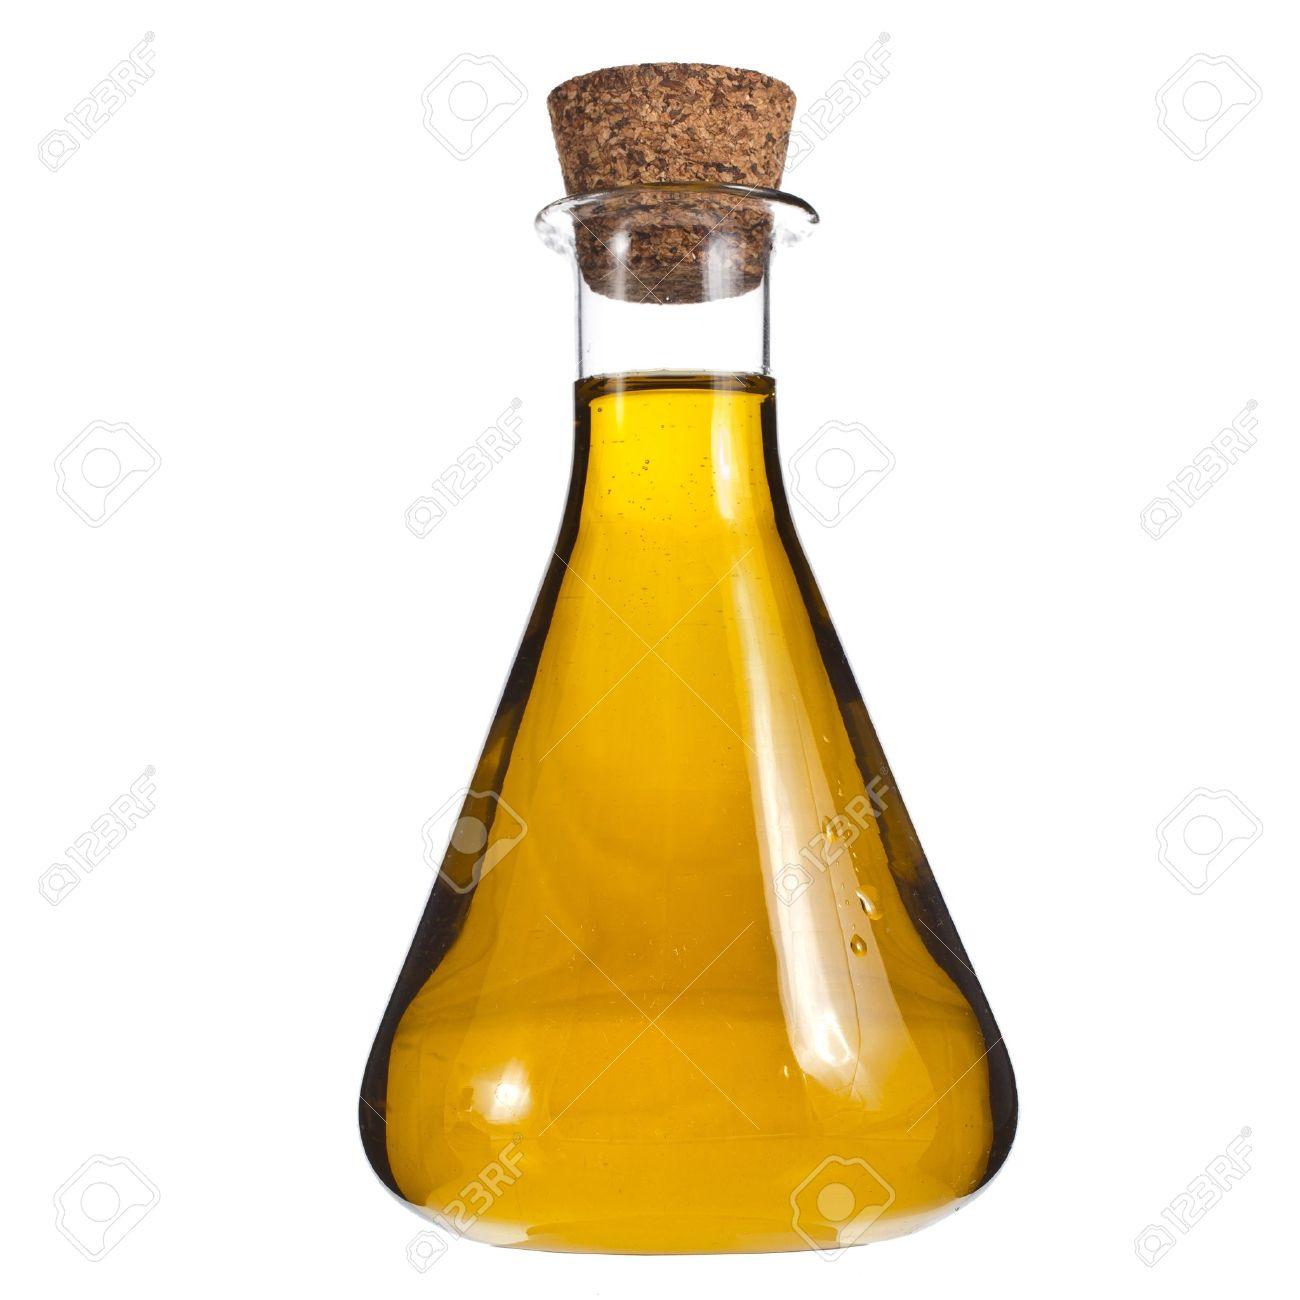 oil bottle isolated on white background Stock Photo - 18374709